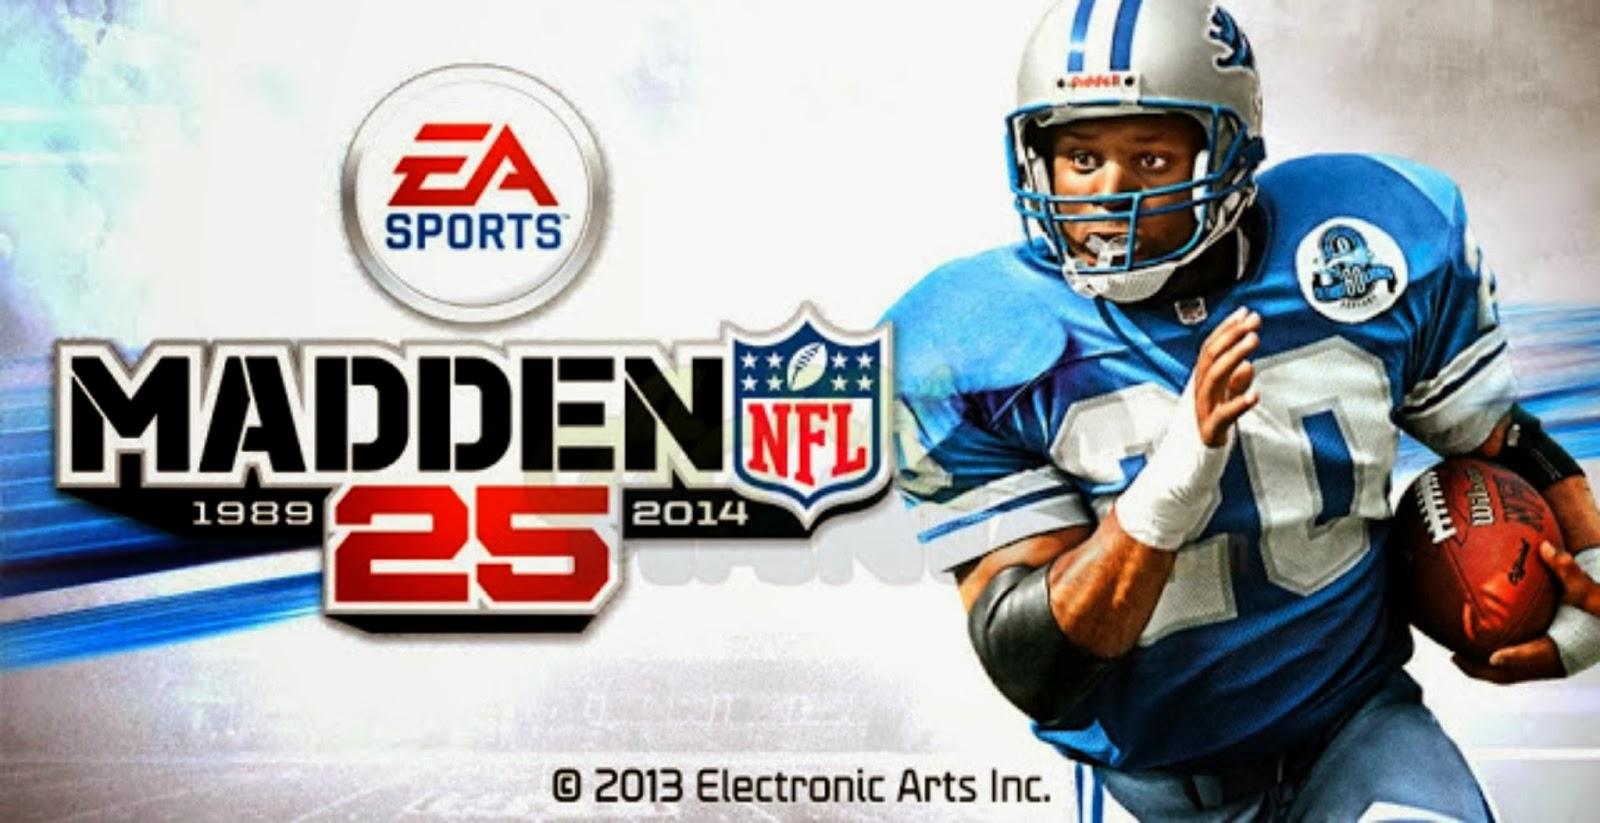 Madden Nfl Ea Sports 93